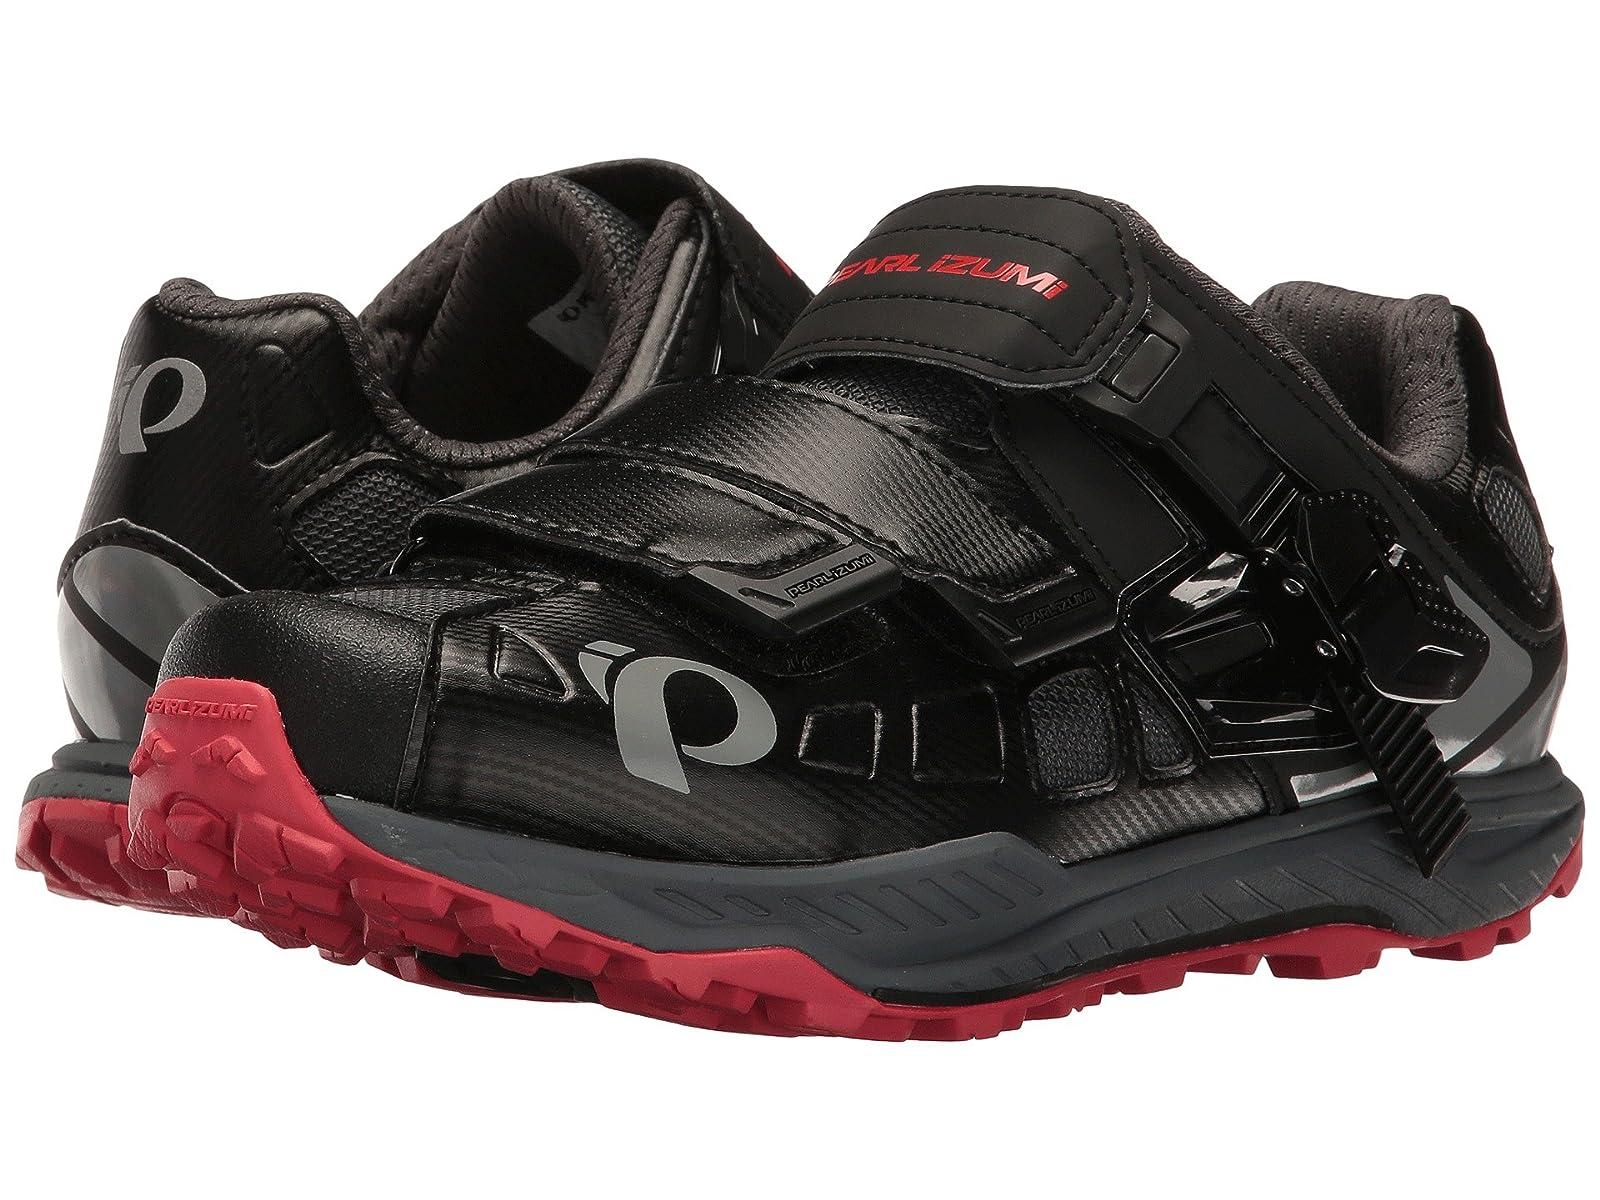 Pearl Izumi X-Alp Enduro V5Cheap and distinctive eye-catching shoes